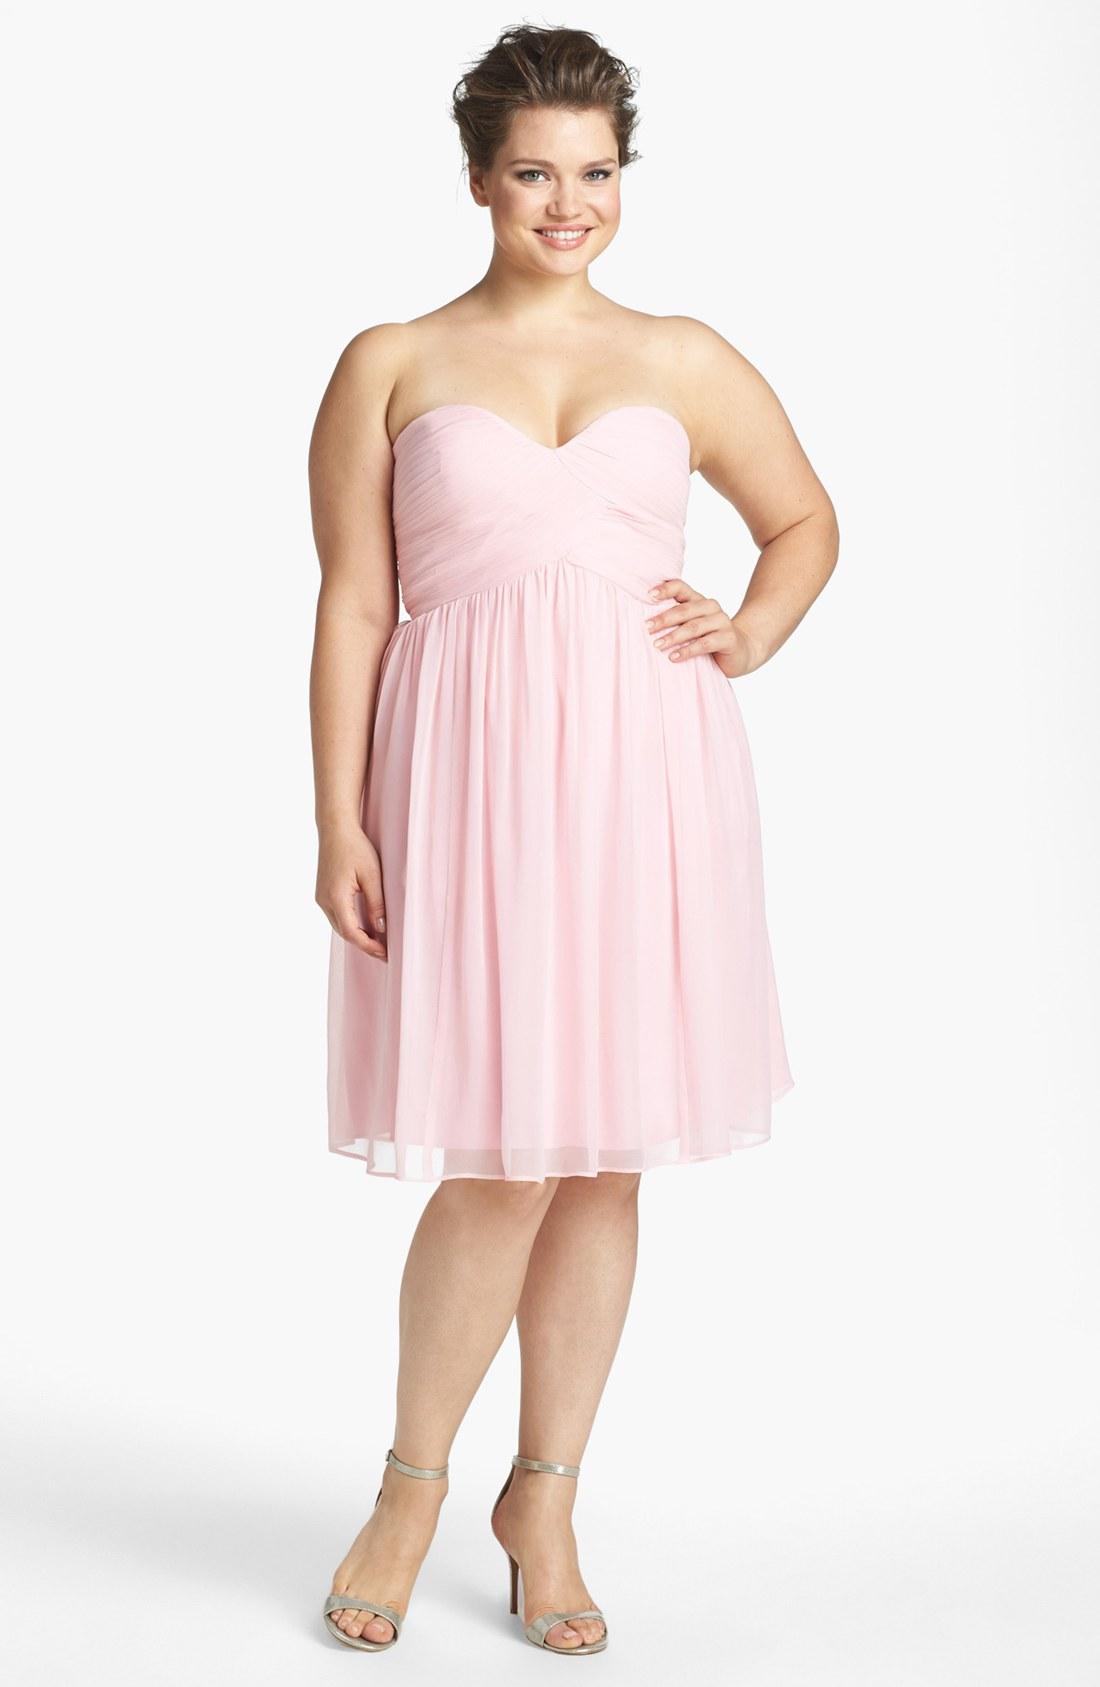 Donna morgan 'Morgan' Strapless Silk Chiffon Dress in Pink | Lyst